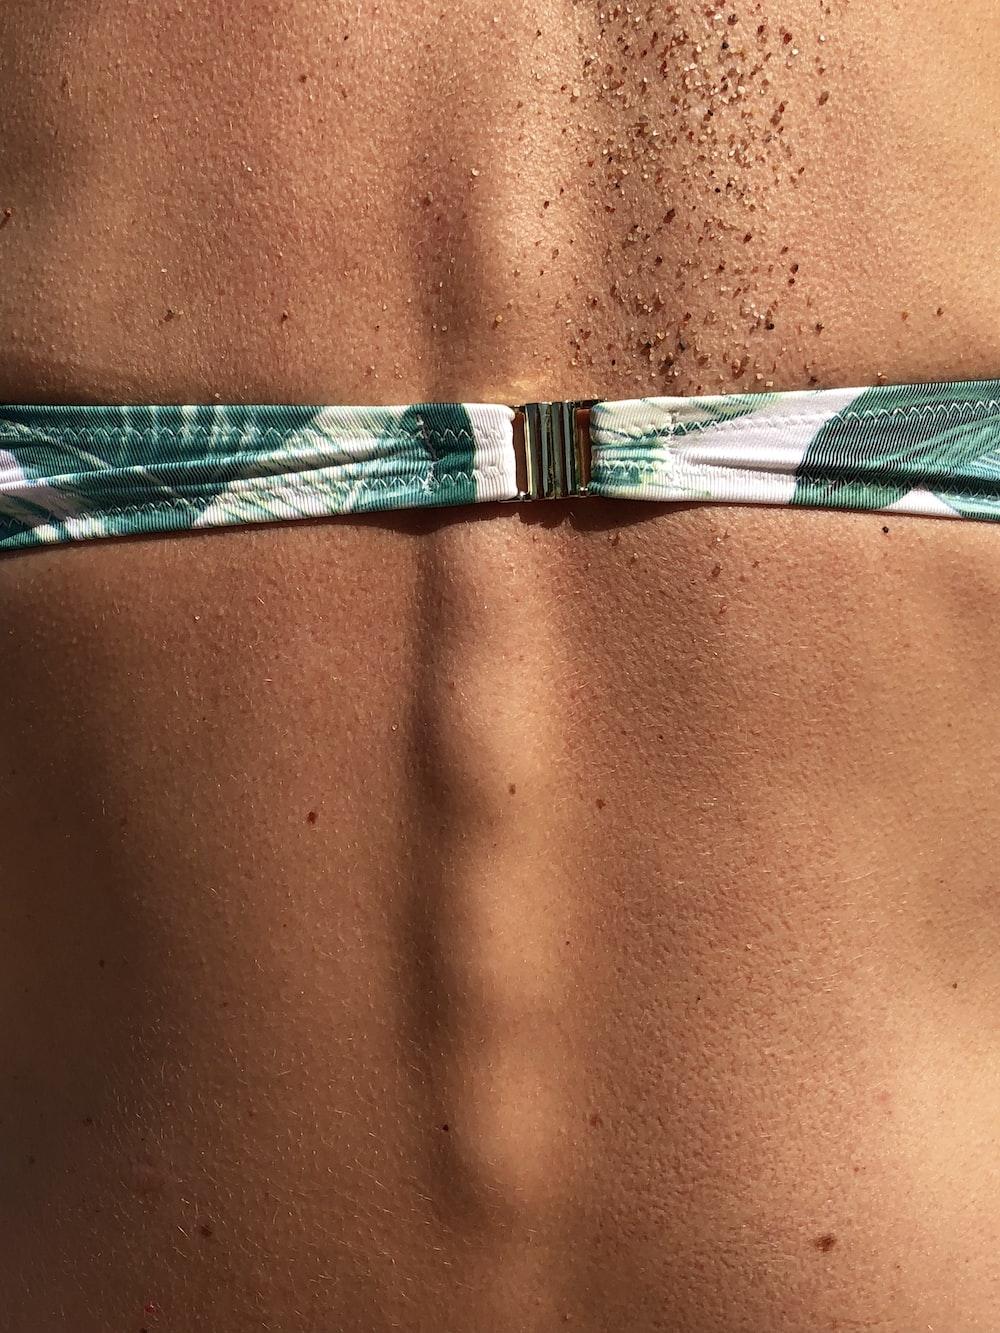 green and white bikini top